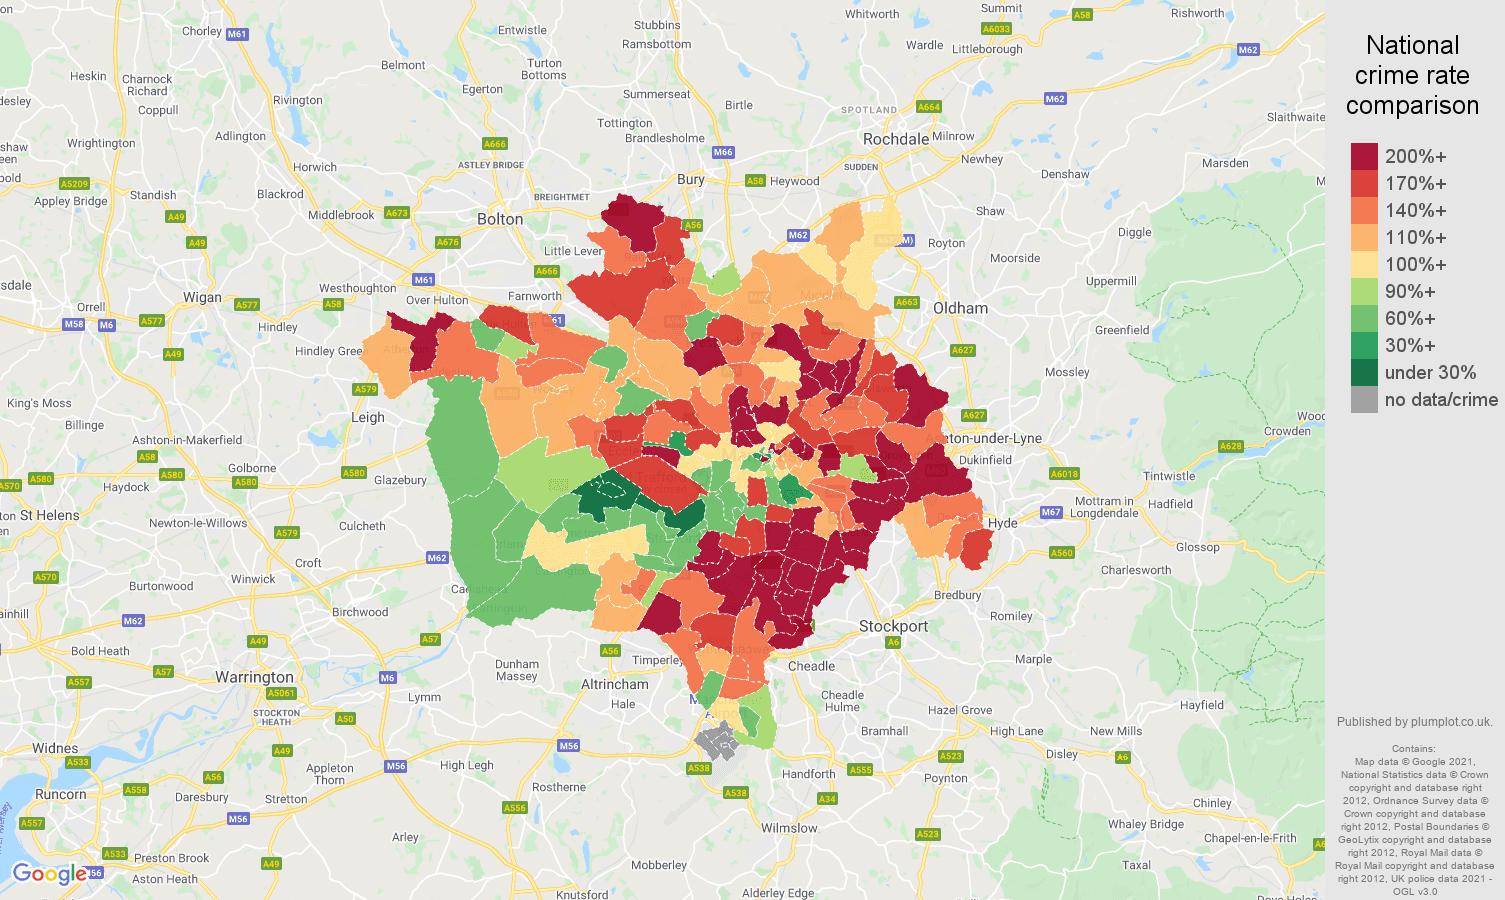 Manchester burglary crime rate comparison map